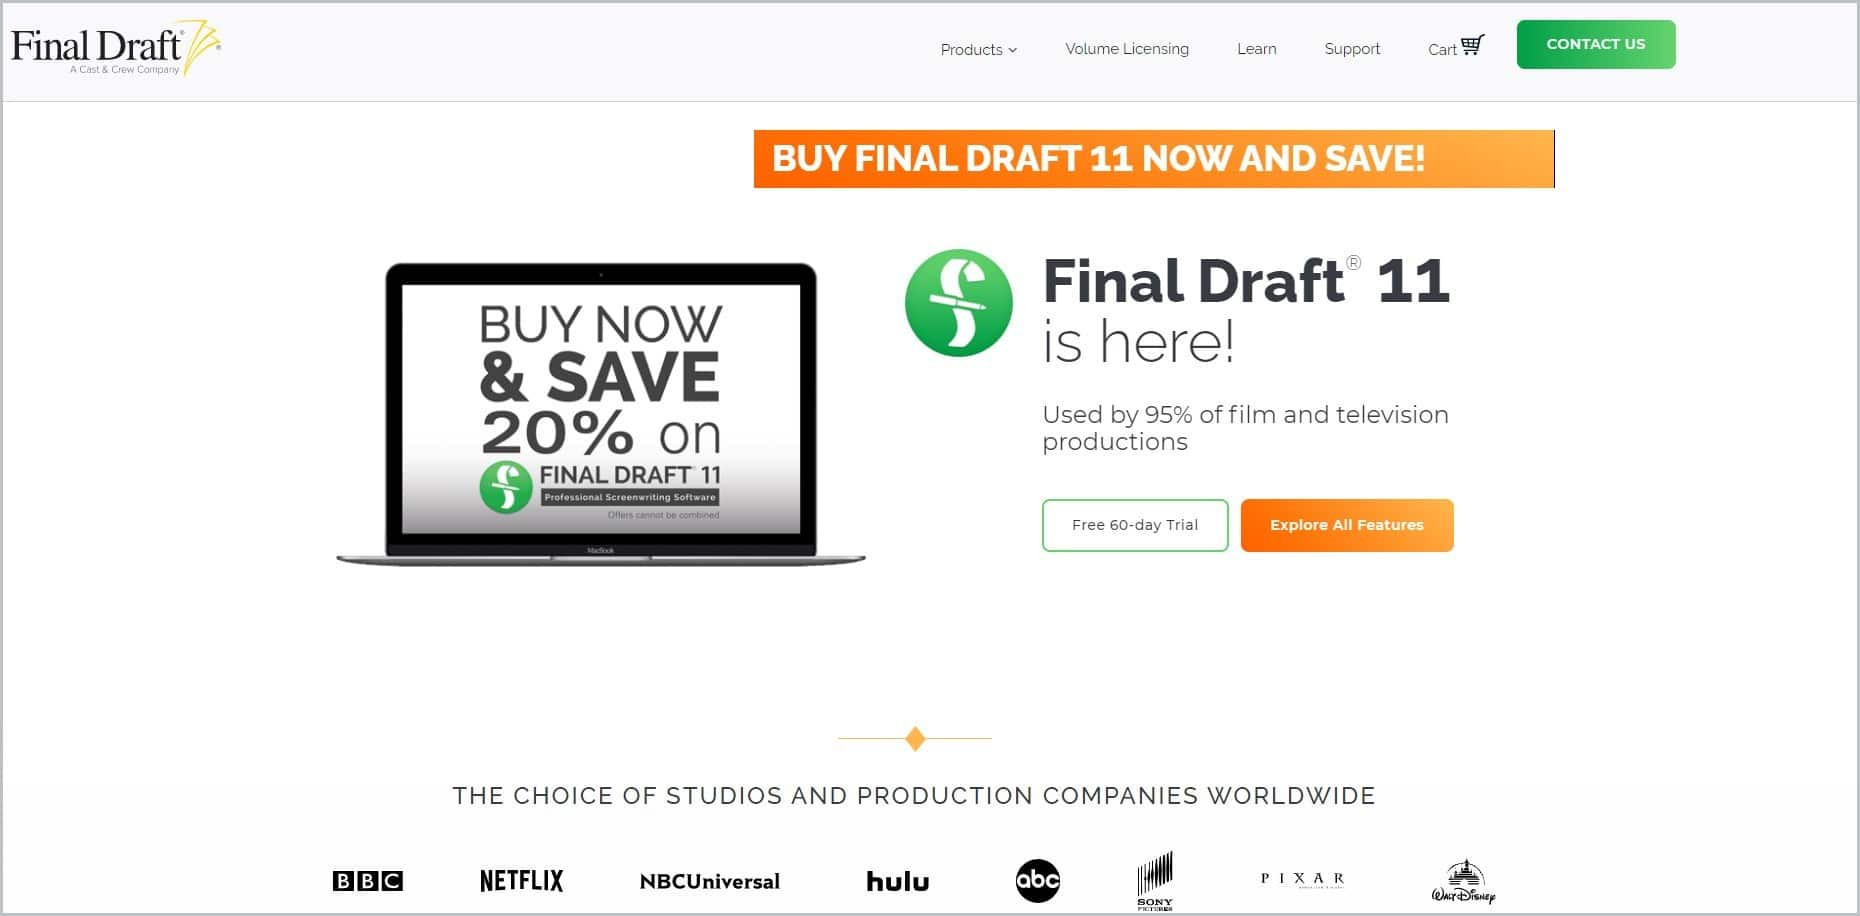 screenshot of Final Draft homepage